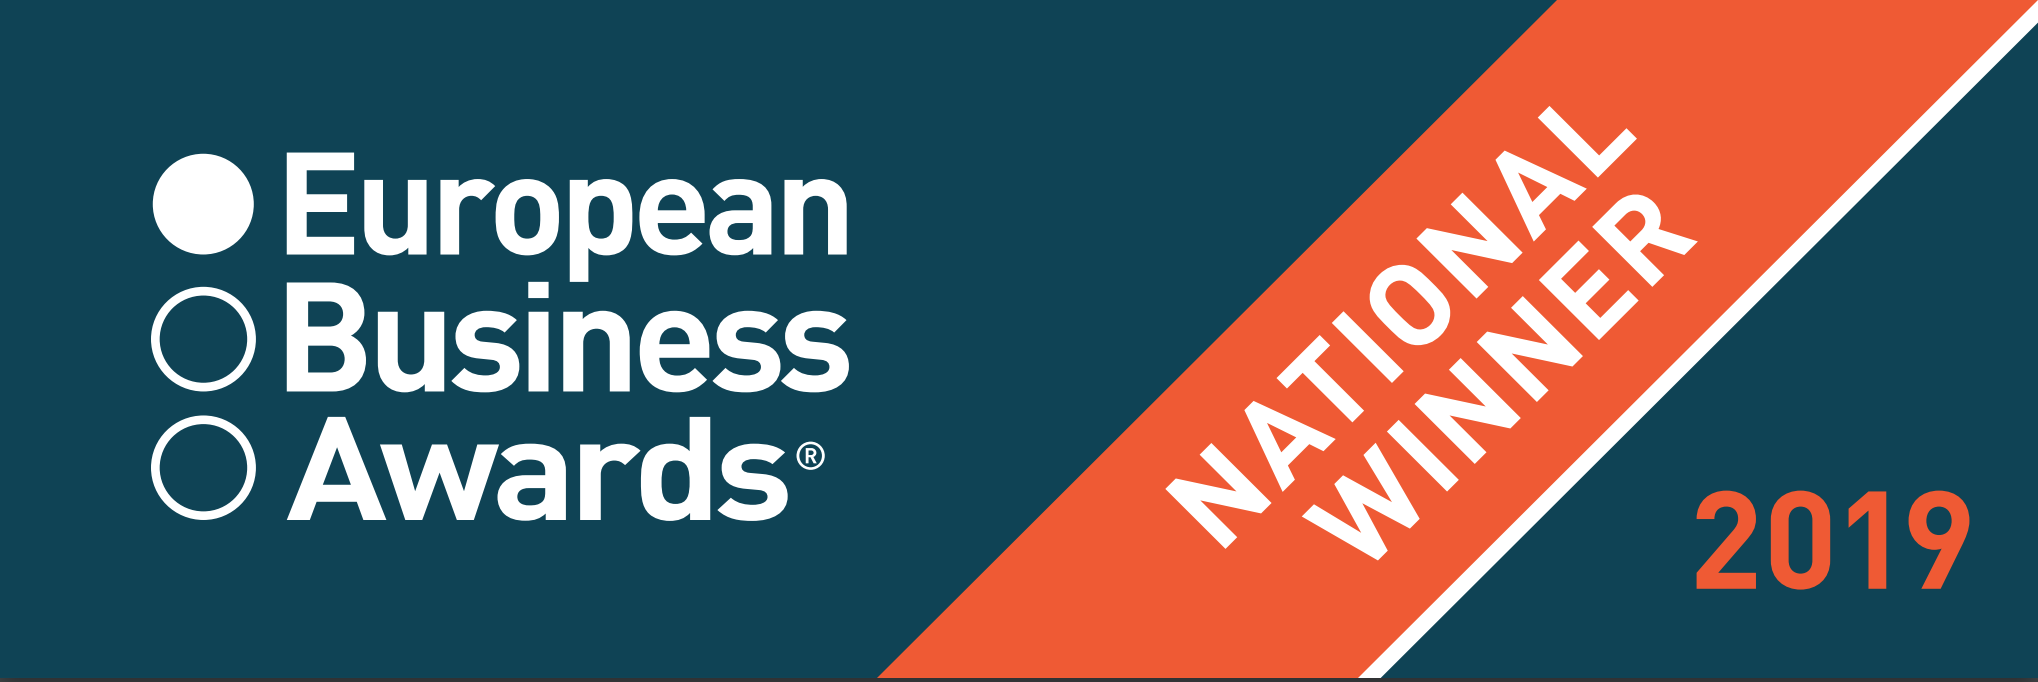 uxda-awarded-european-business-award